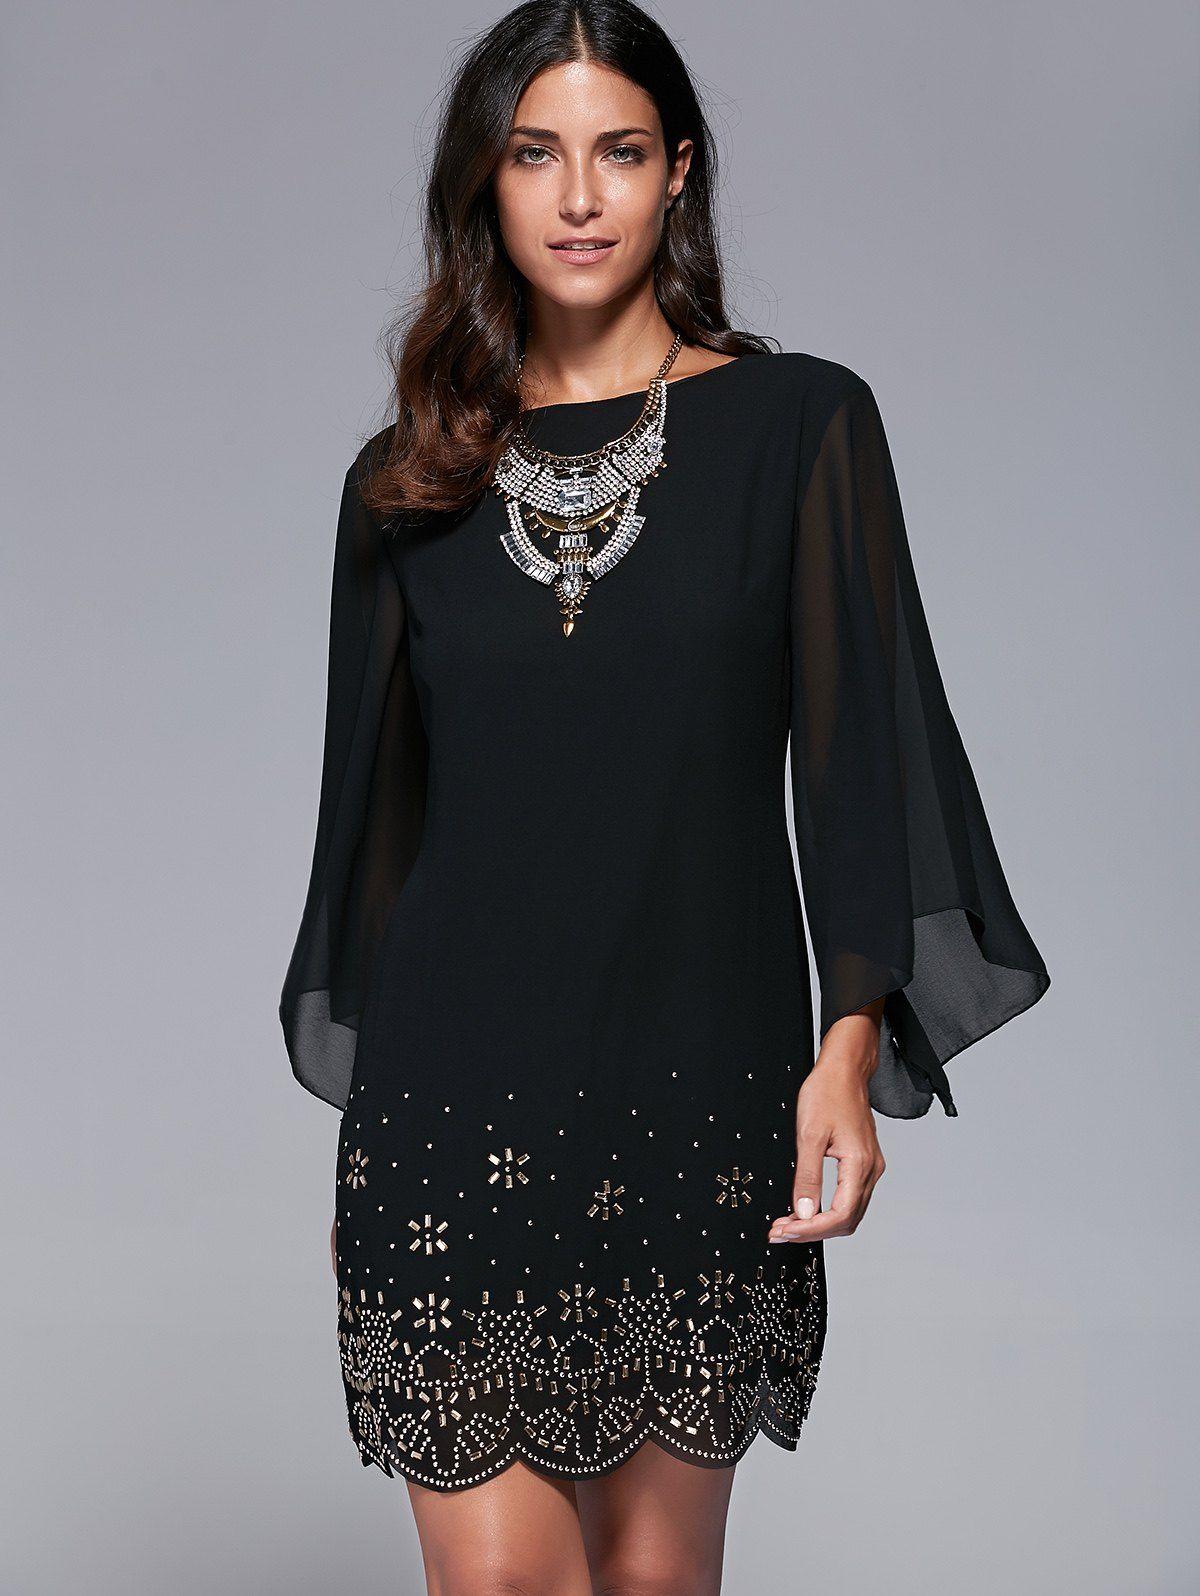 r k plus size dresses long sleeve | my best dresses | pinterest